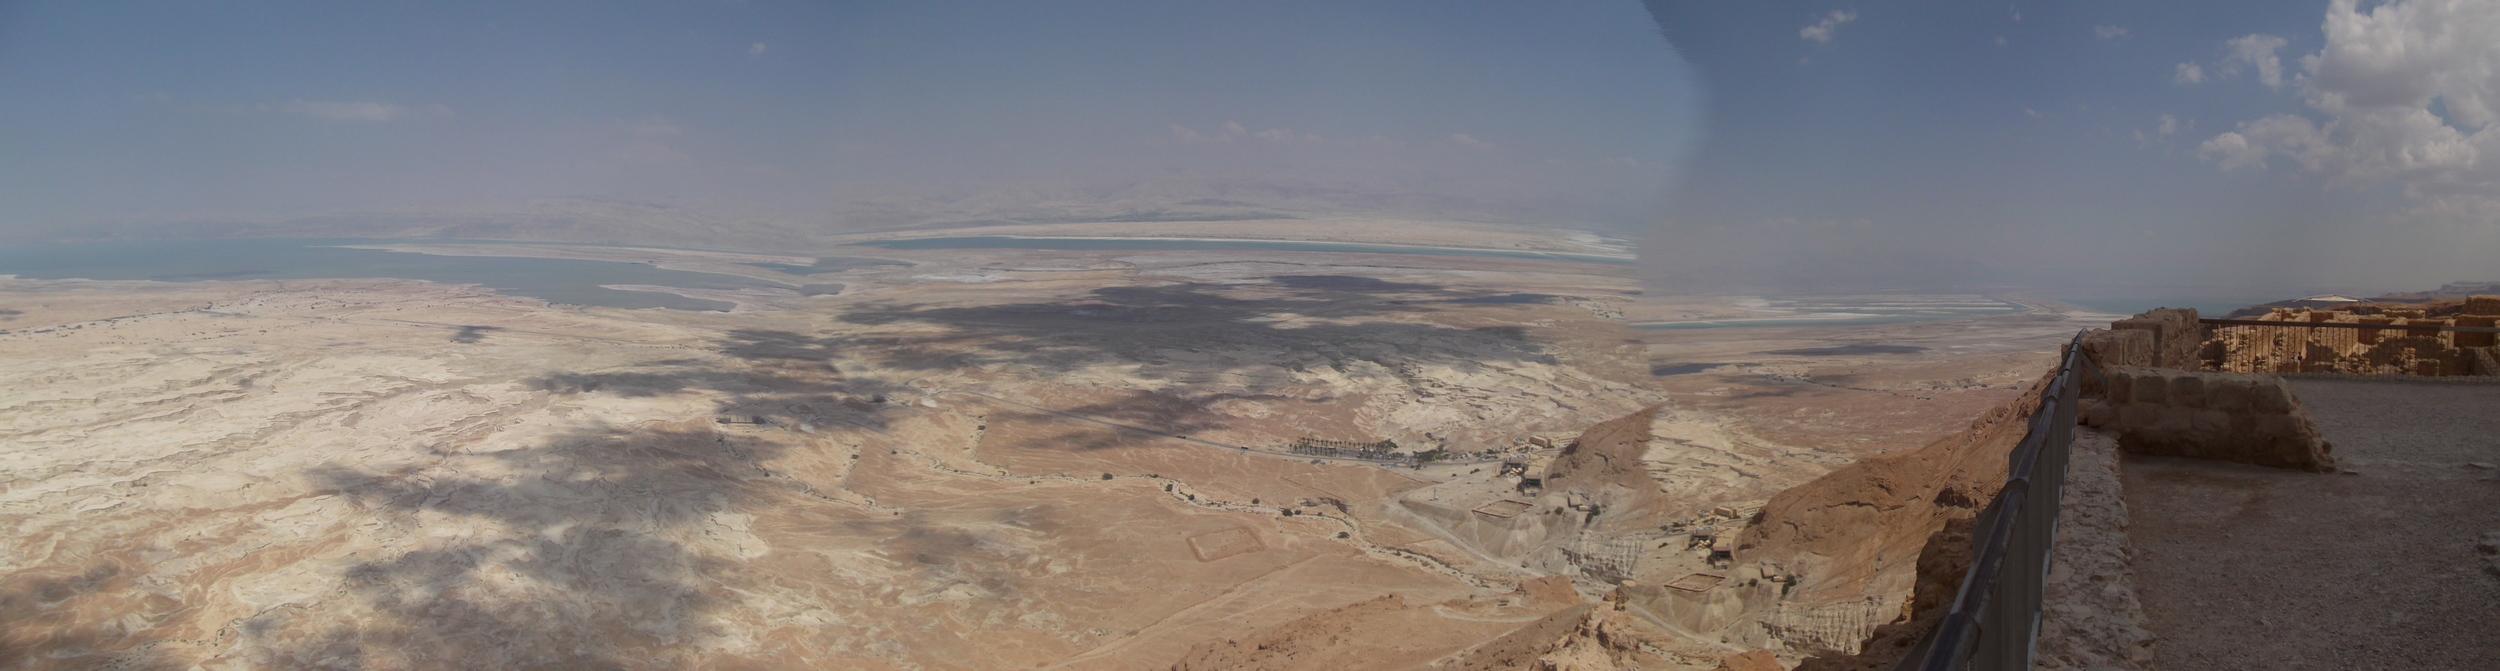 The Southern Judean Desert Along the Dead Sea